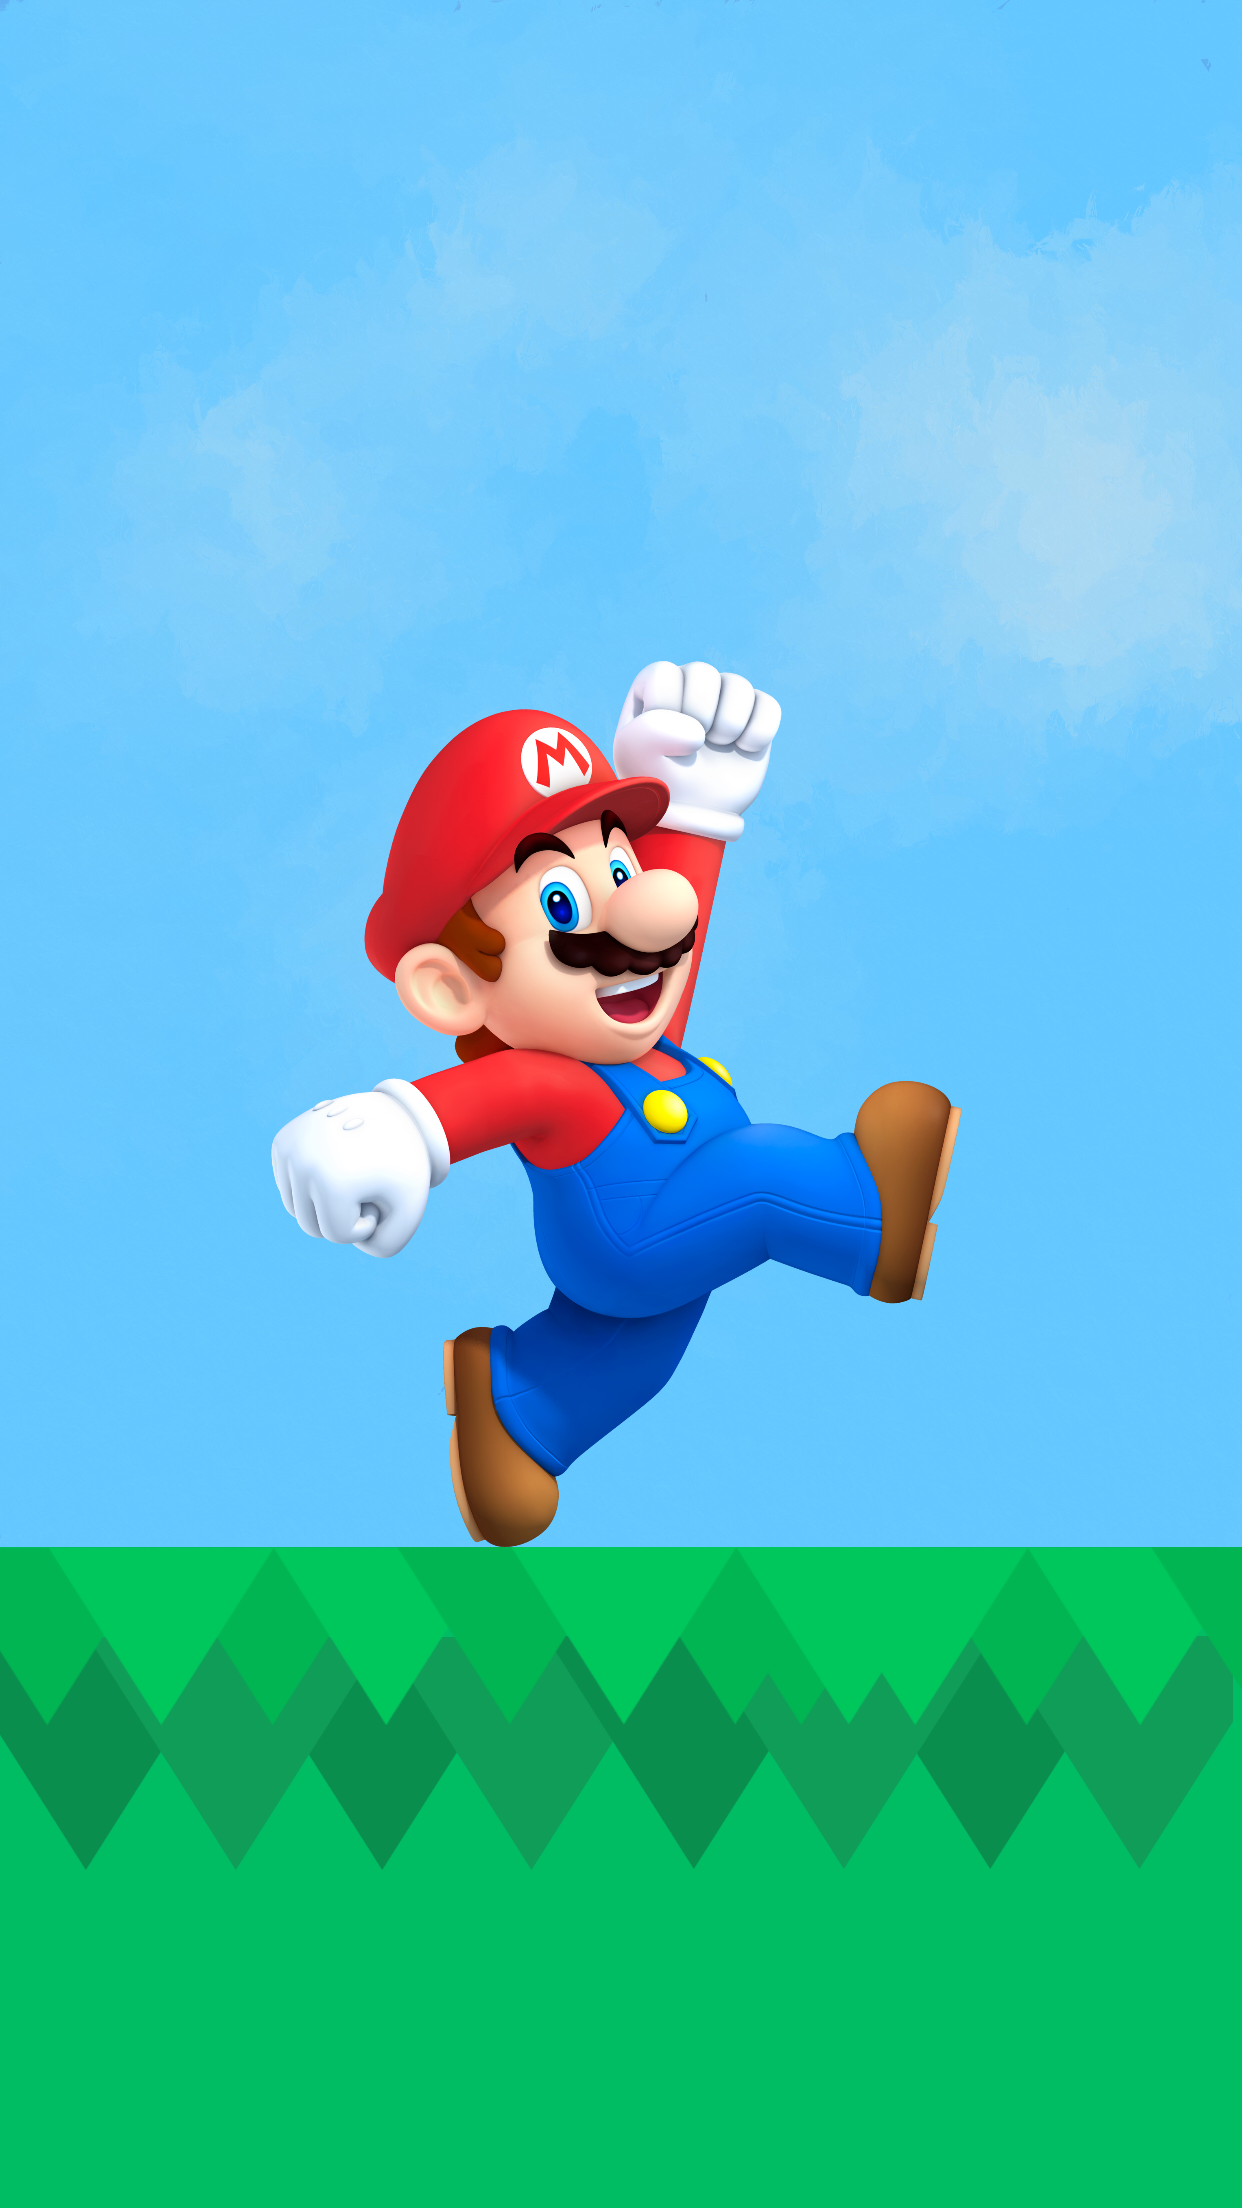 Wallpaper iphone mario bross - Super Mario Iphone Wallpaper